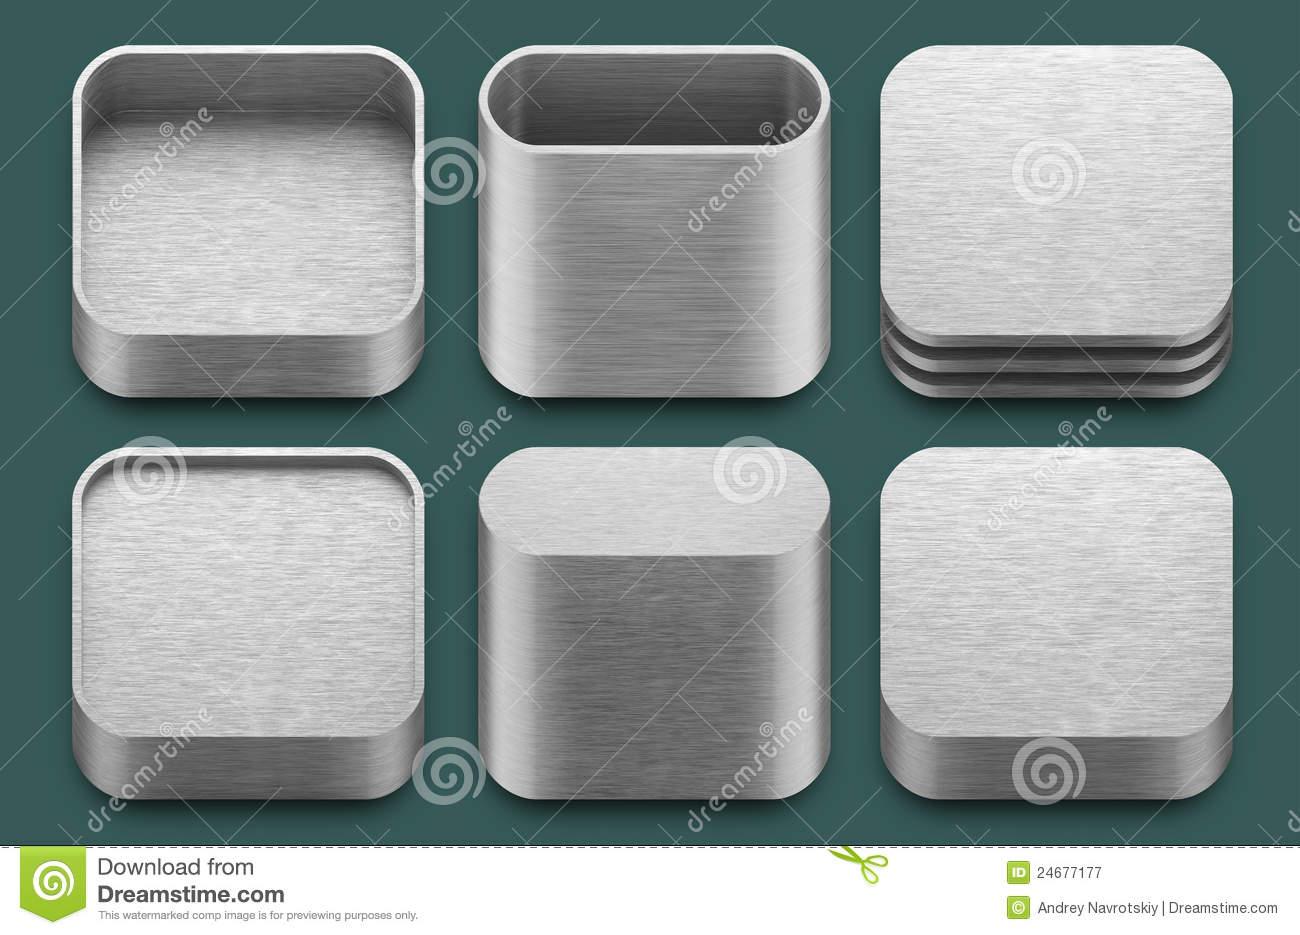 8 IPad Blank App Icon Images